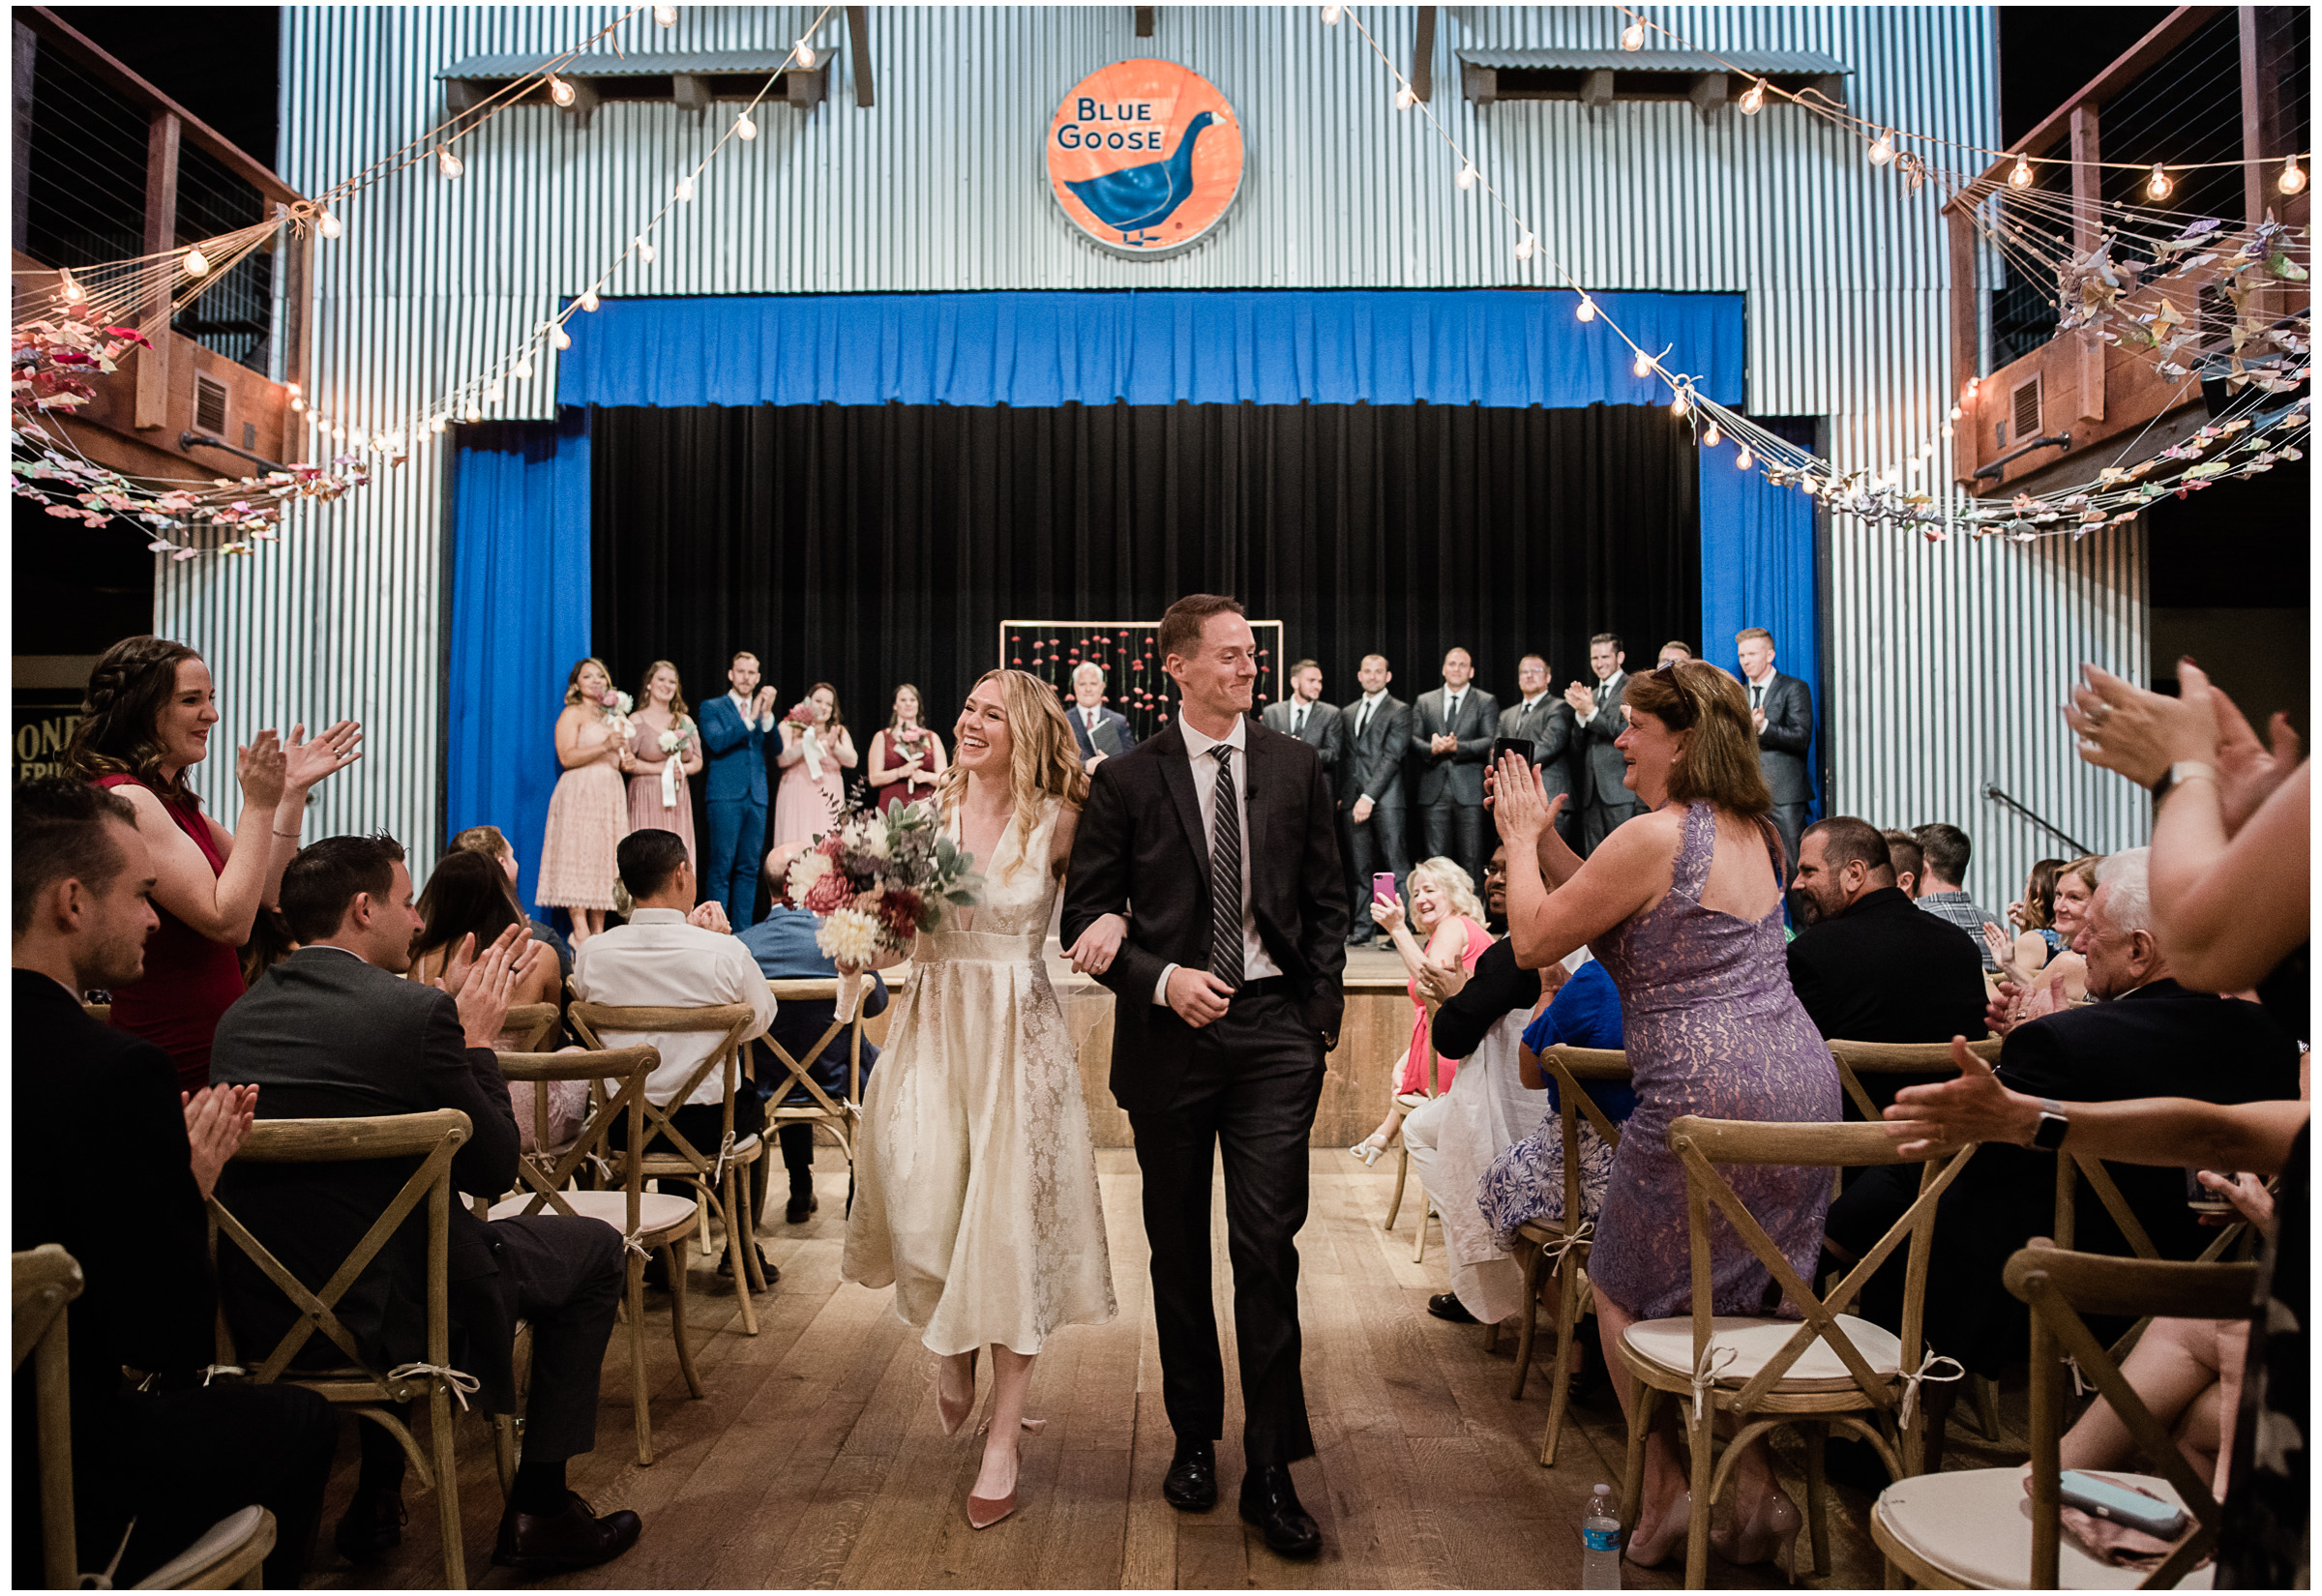 Loomis Wedding - Sacramento Photographer - Blue Goose - Justin Wilcox Photography - 14.jpg